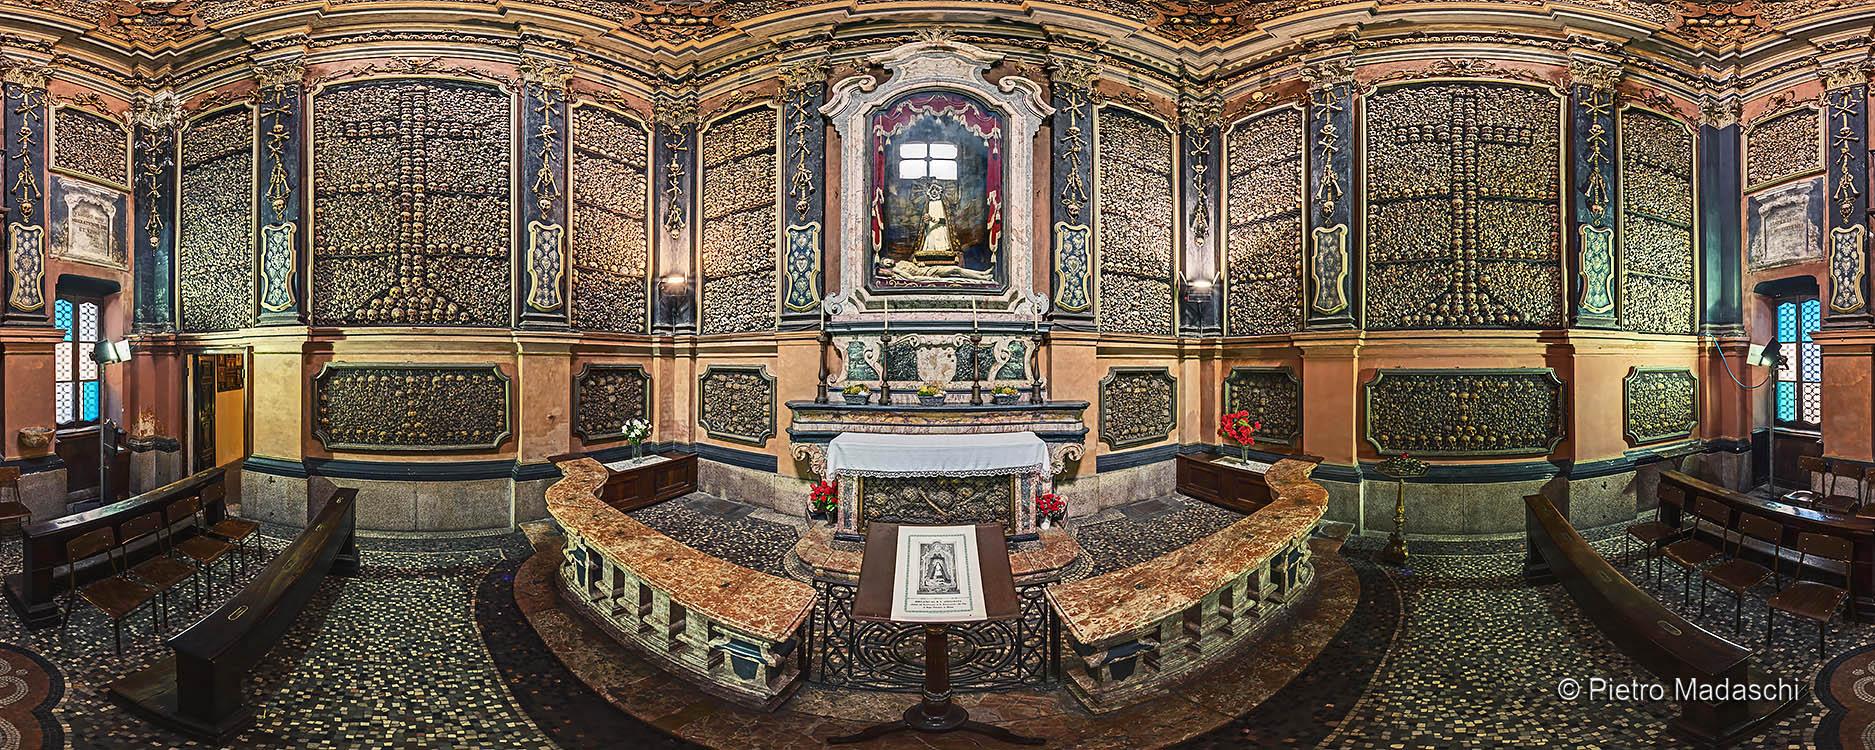 "The ""San Bernardino alle Ossa"" Ossuary in the Chapel of the 16th Century"